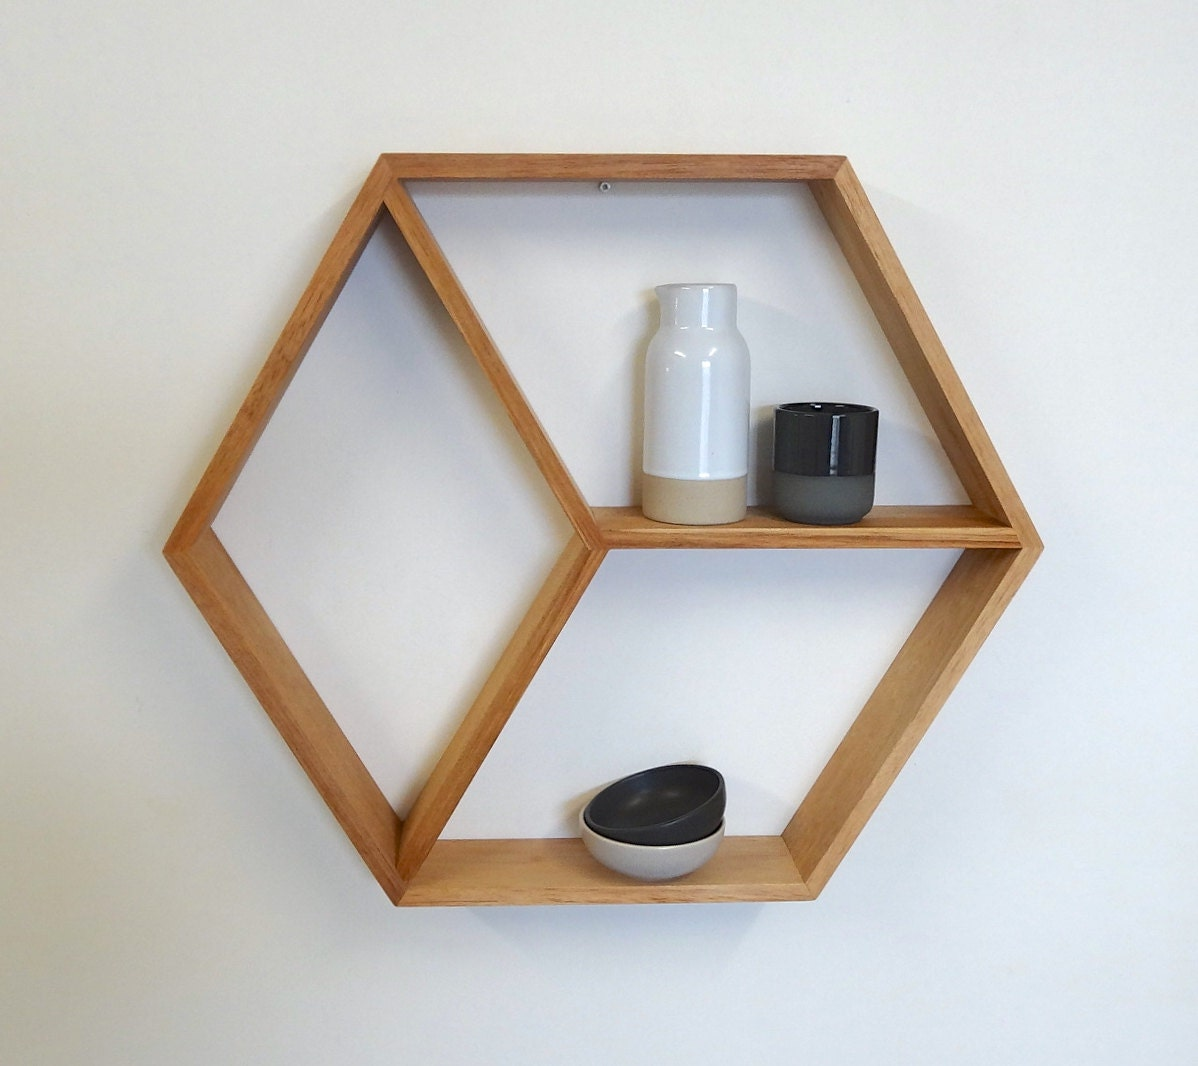 Hexagon Wooden Shelf Geometric Shelf Maple